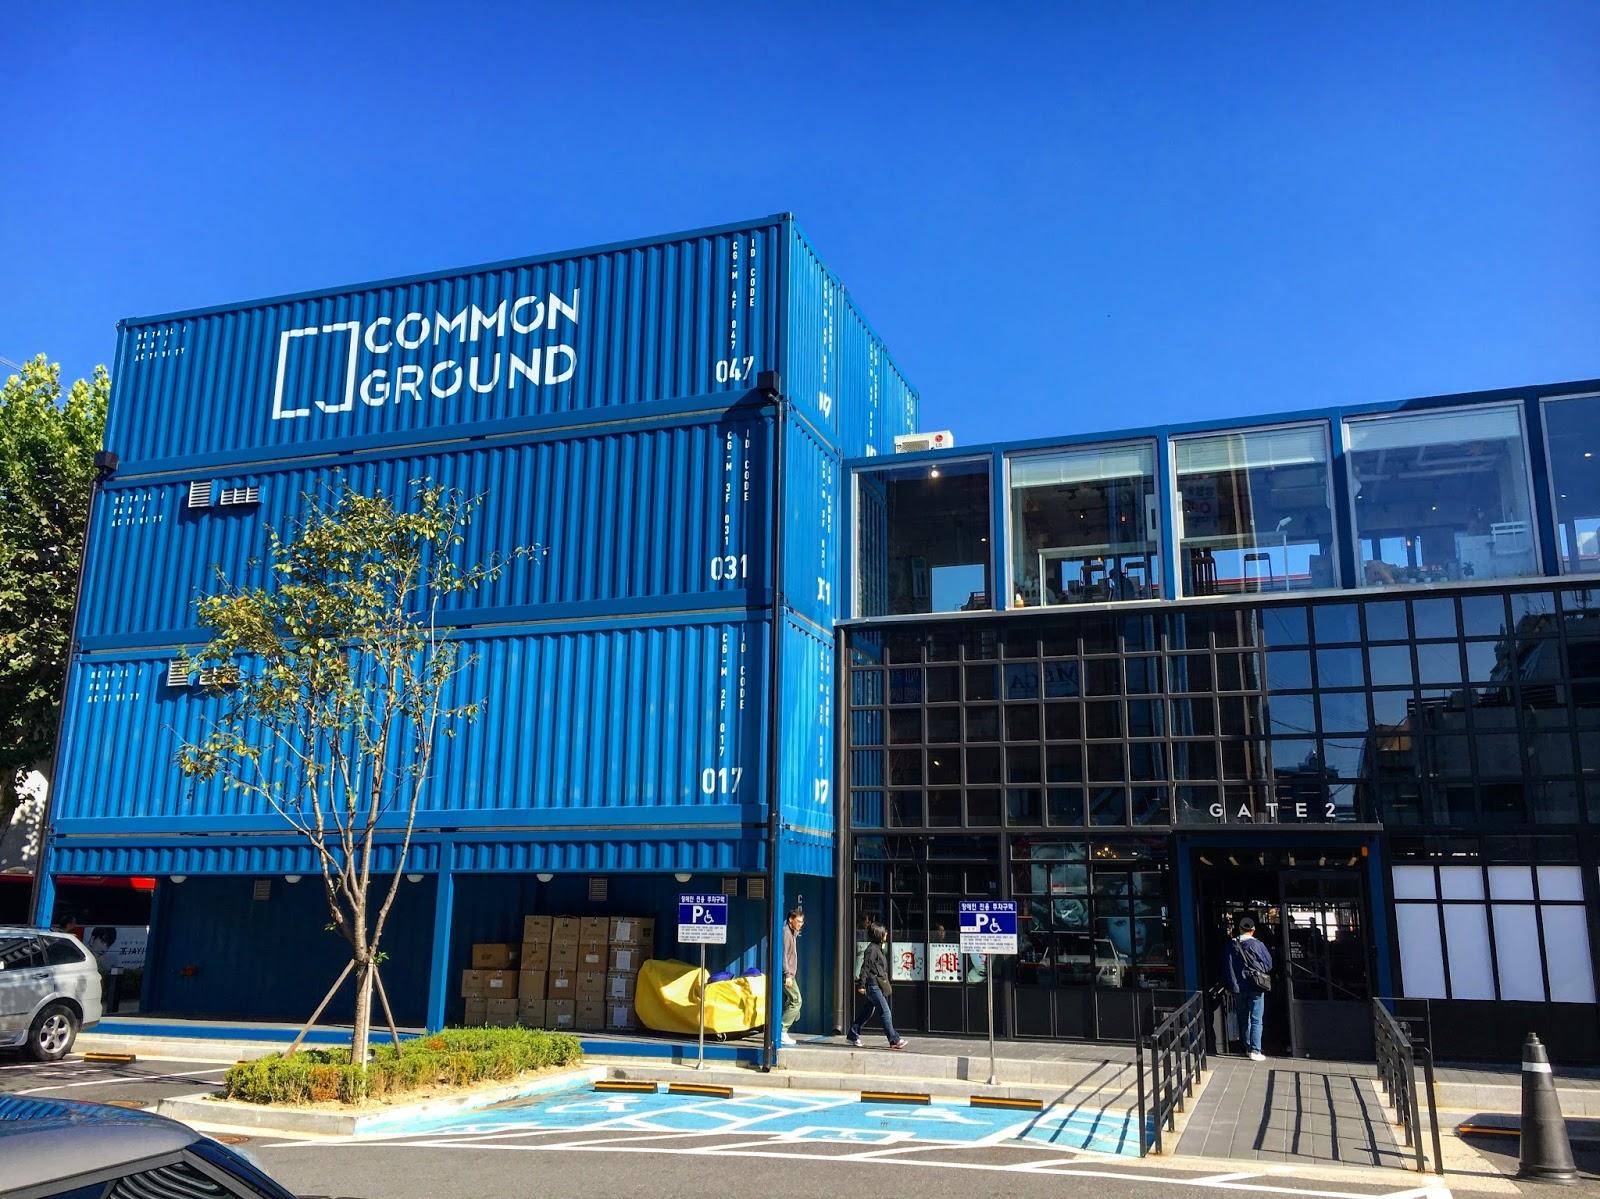 Common Ground - Seoul, South Korea - Travel & Adventure